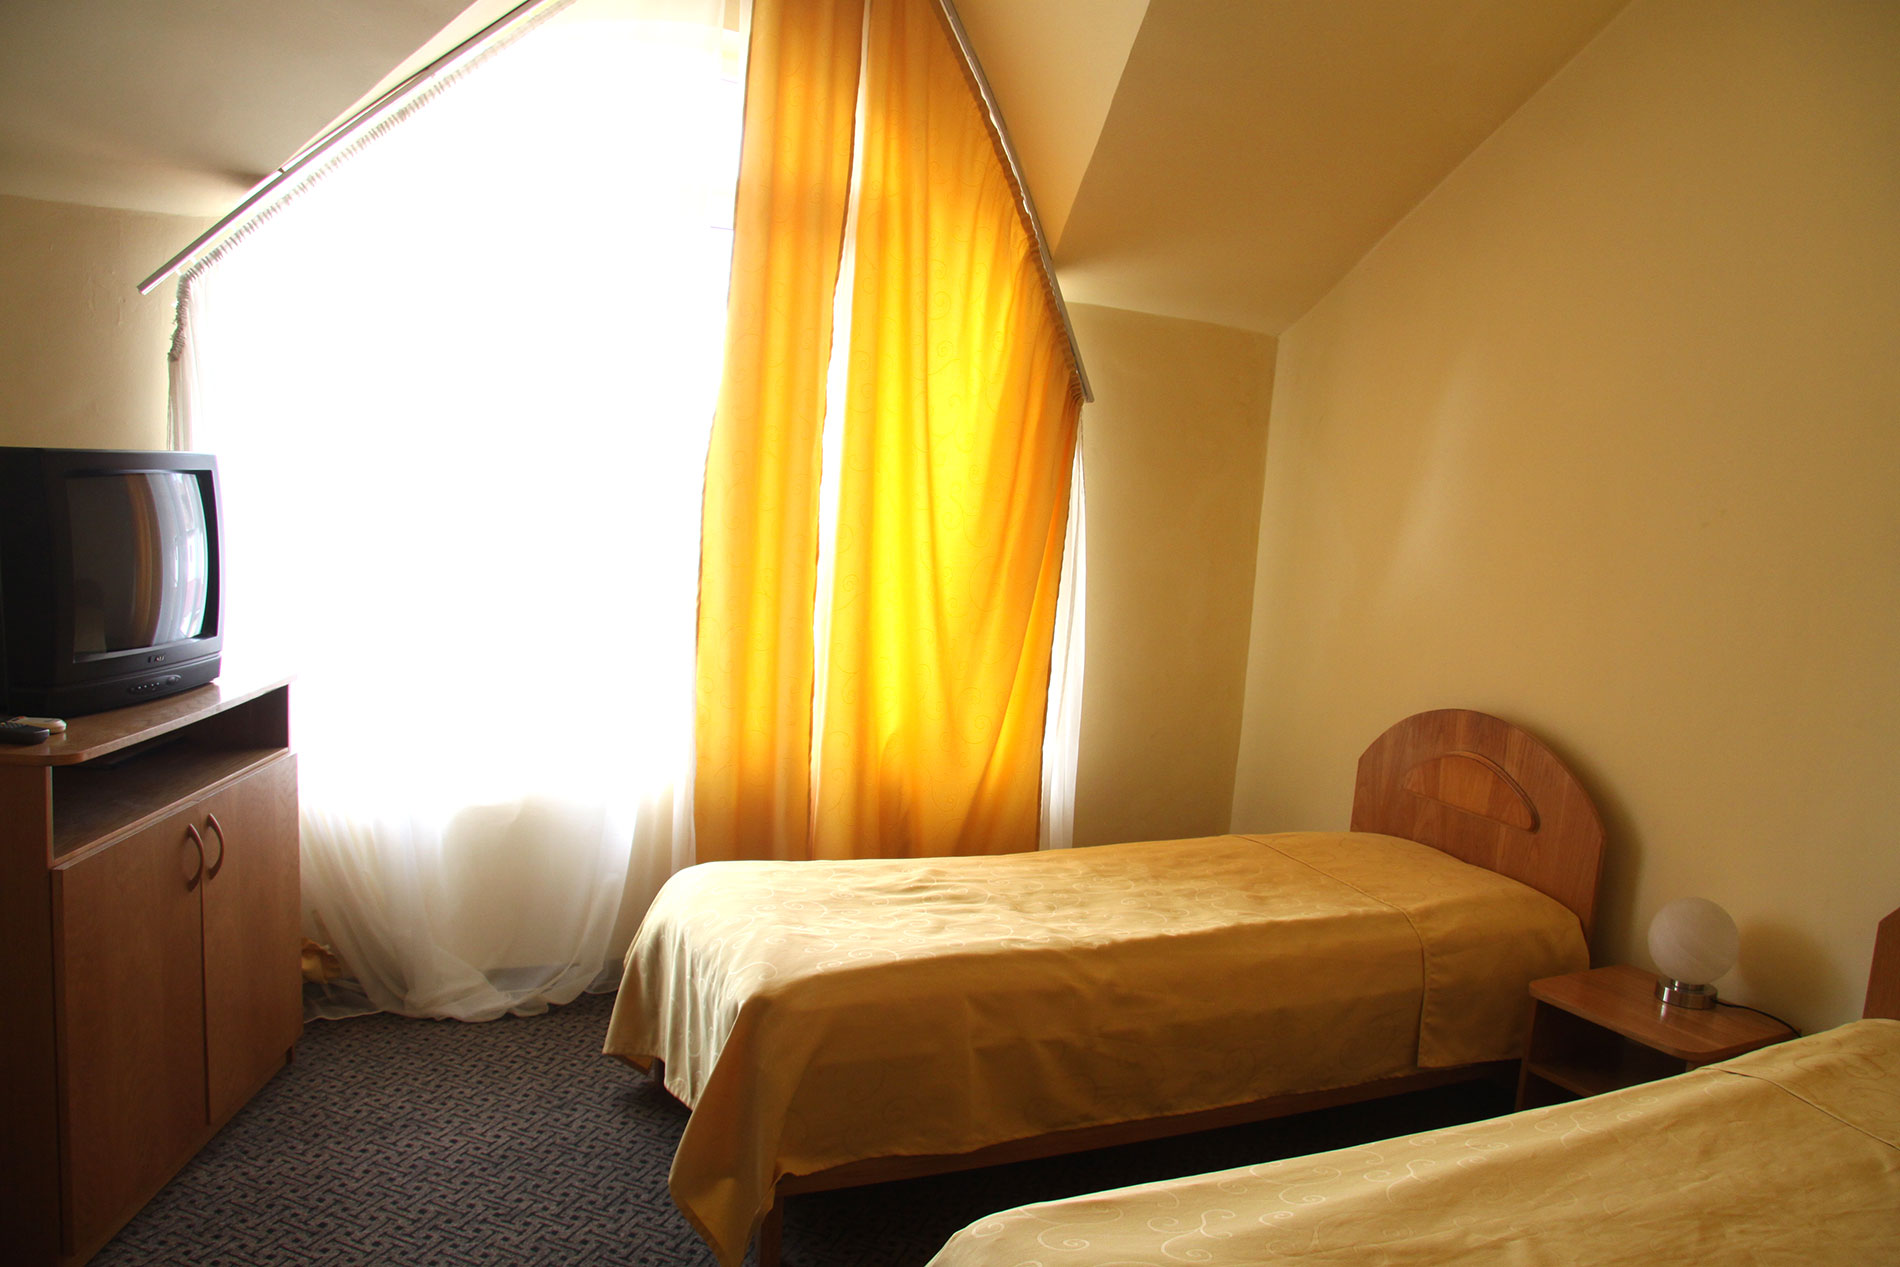 camera-hotel-corola-oradea-cazare-oradea-1